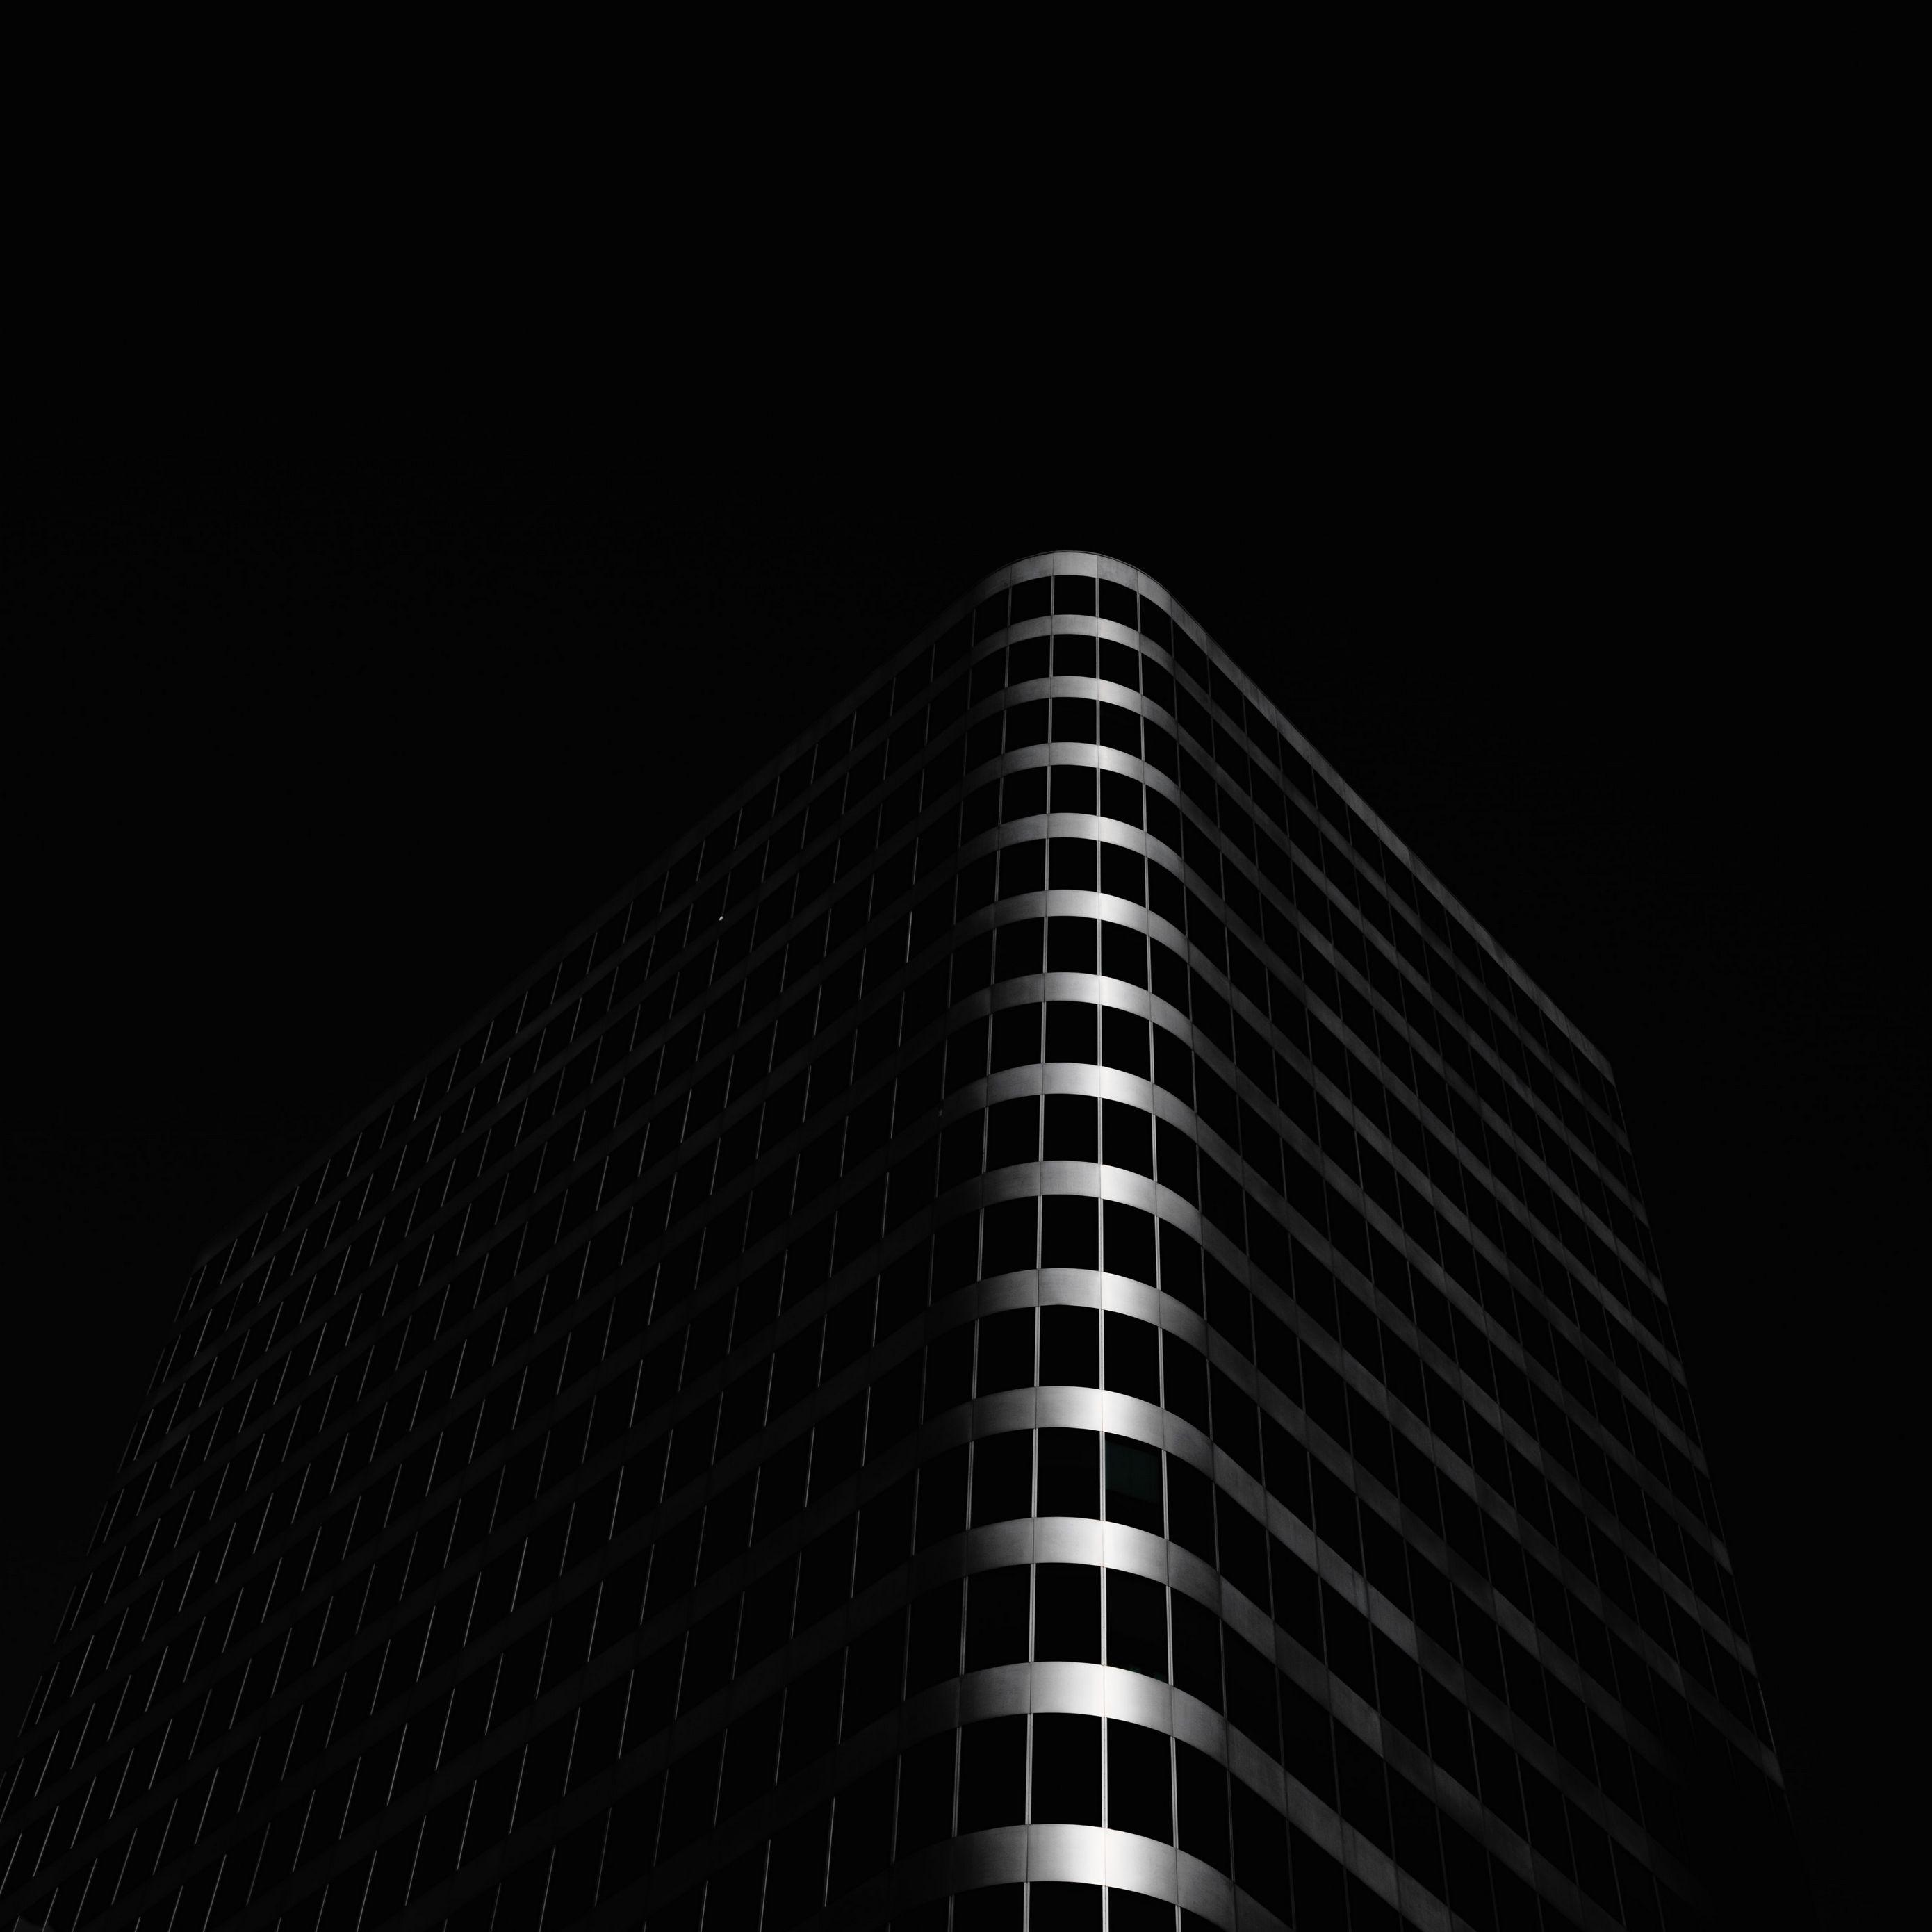 2780x2780 Wallpaper building, architecture, black, dark